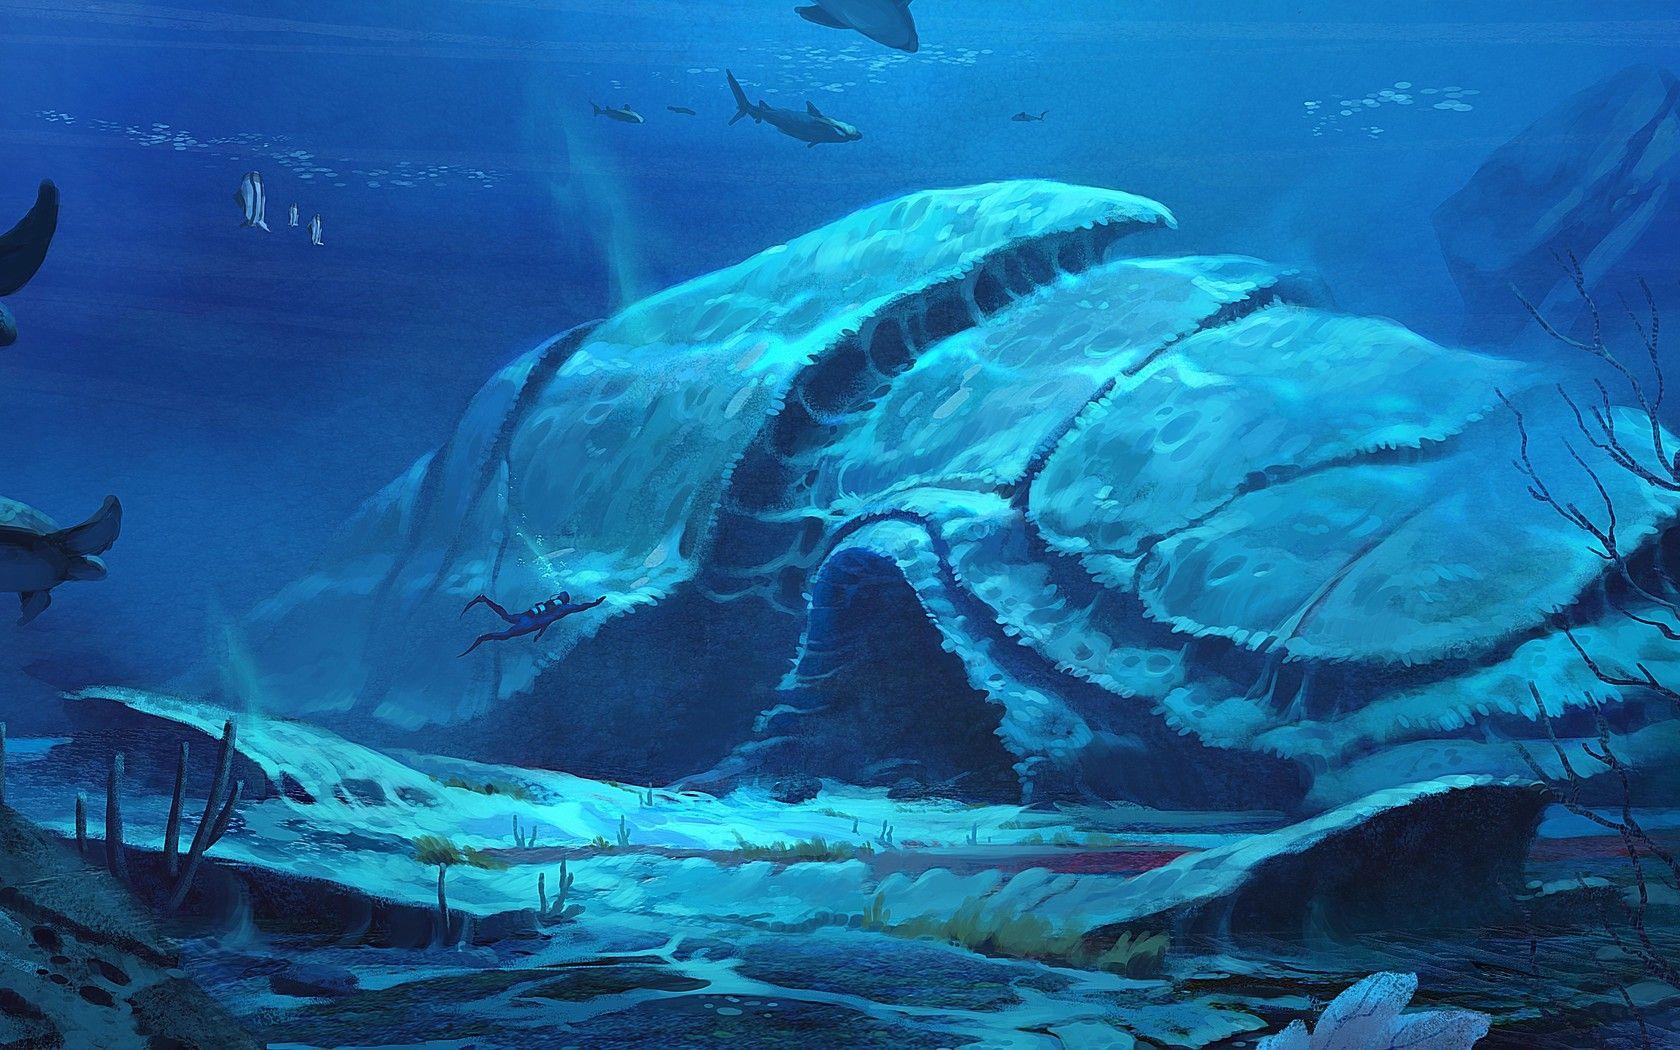 Download Wallpaper Underwater Sea Art Diver Free Desktop Wallpaper In The Resolution 1680x1050 Picture Underwater City Underwater Art Underwater World